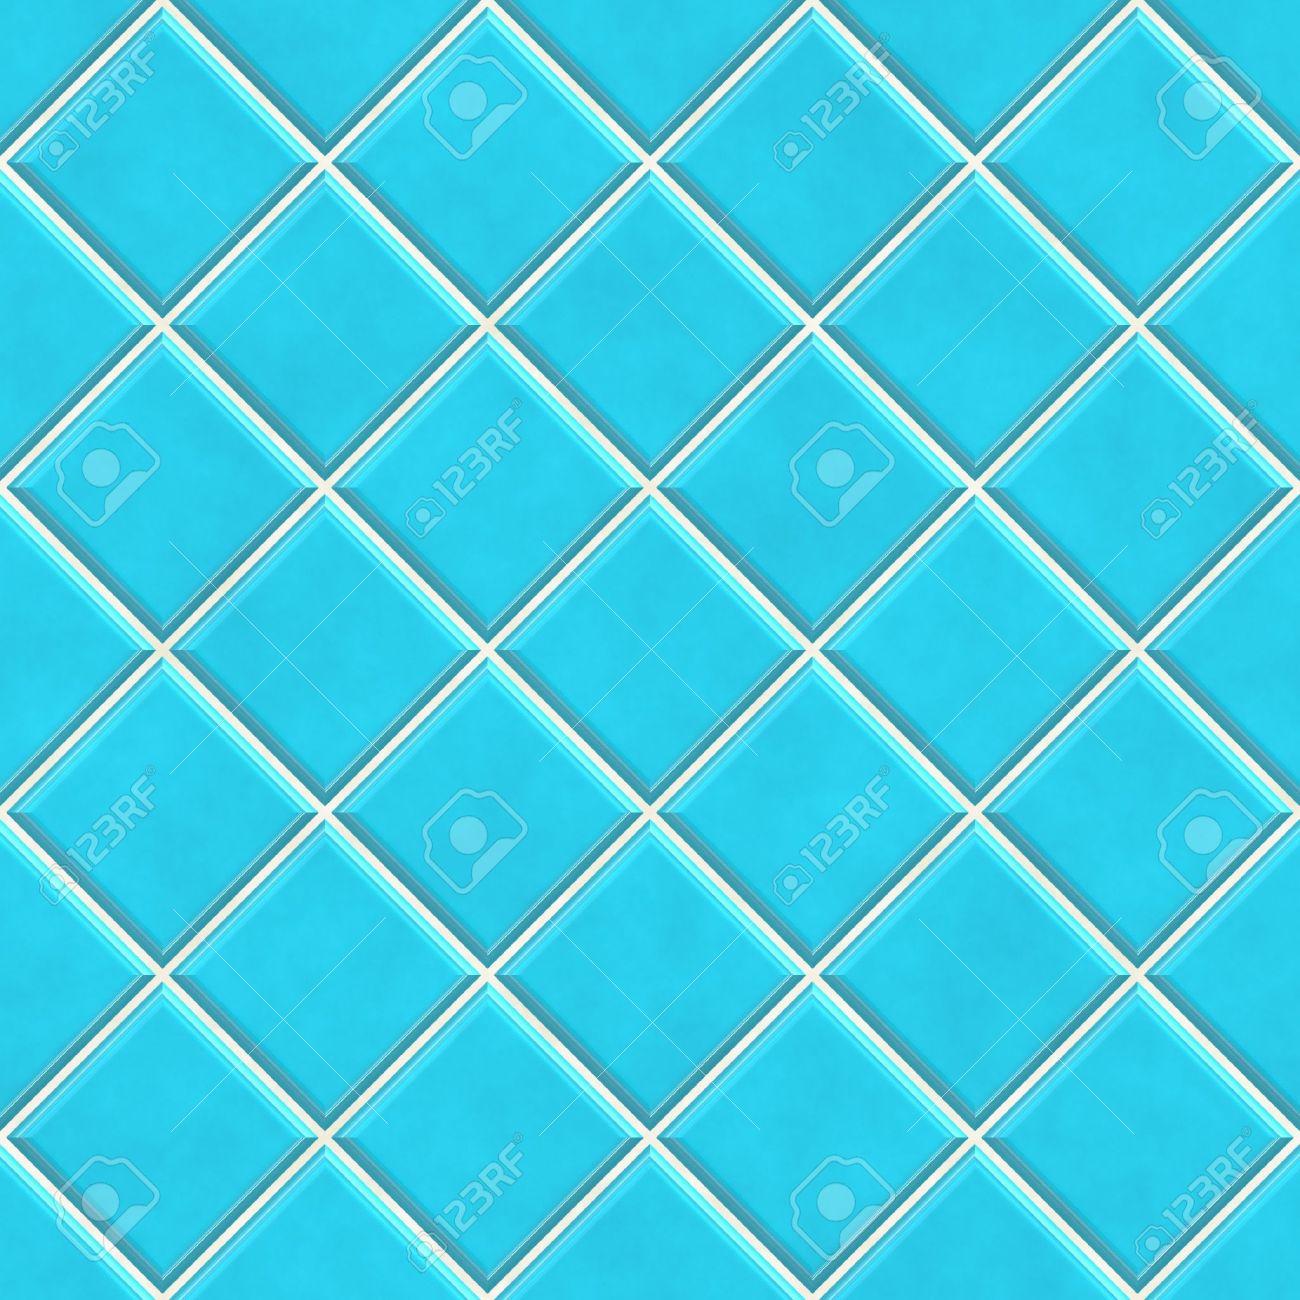 Green tiles kitchen texture - Seamless Blue Tiles Texture Background Kitchen Or Bathroom Concept Stock Photo 7306524